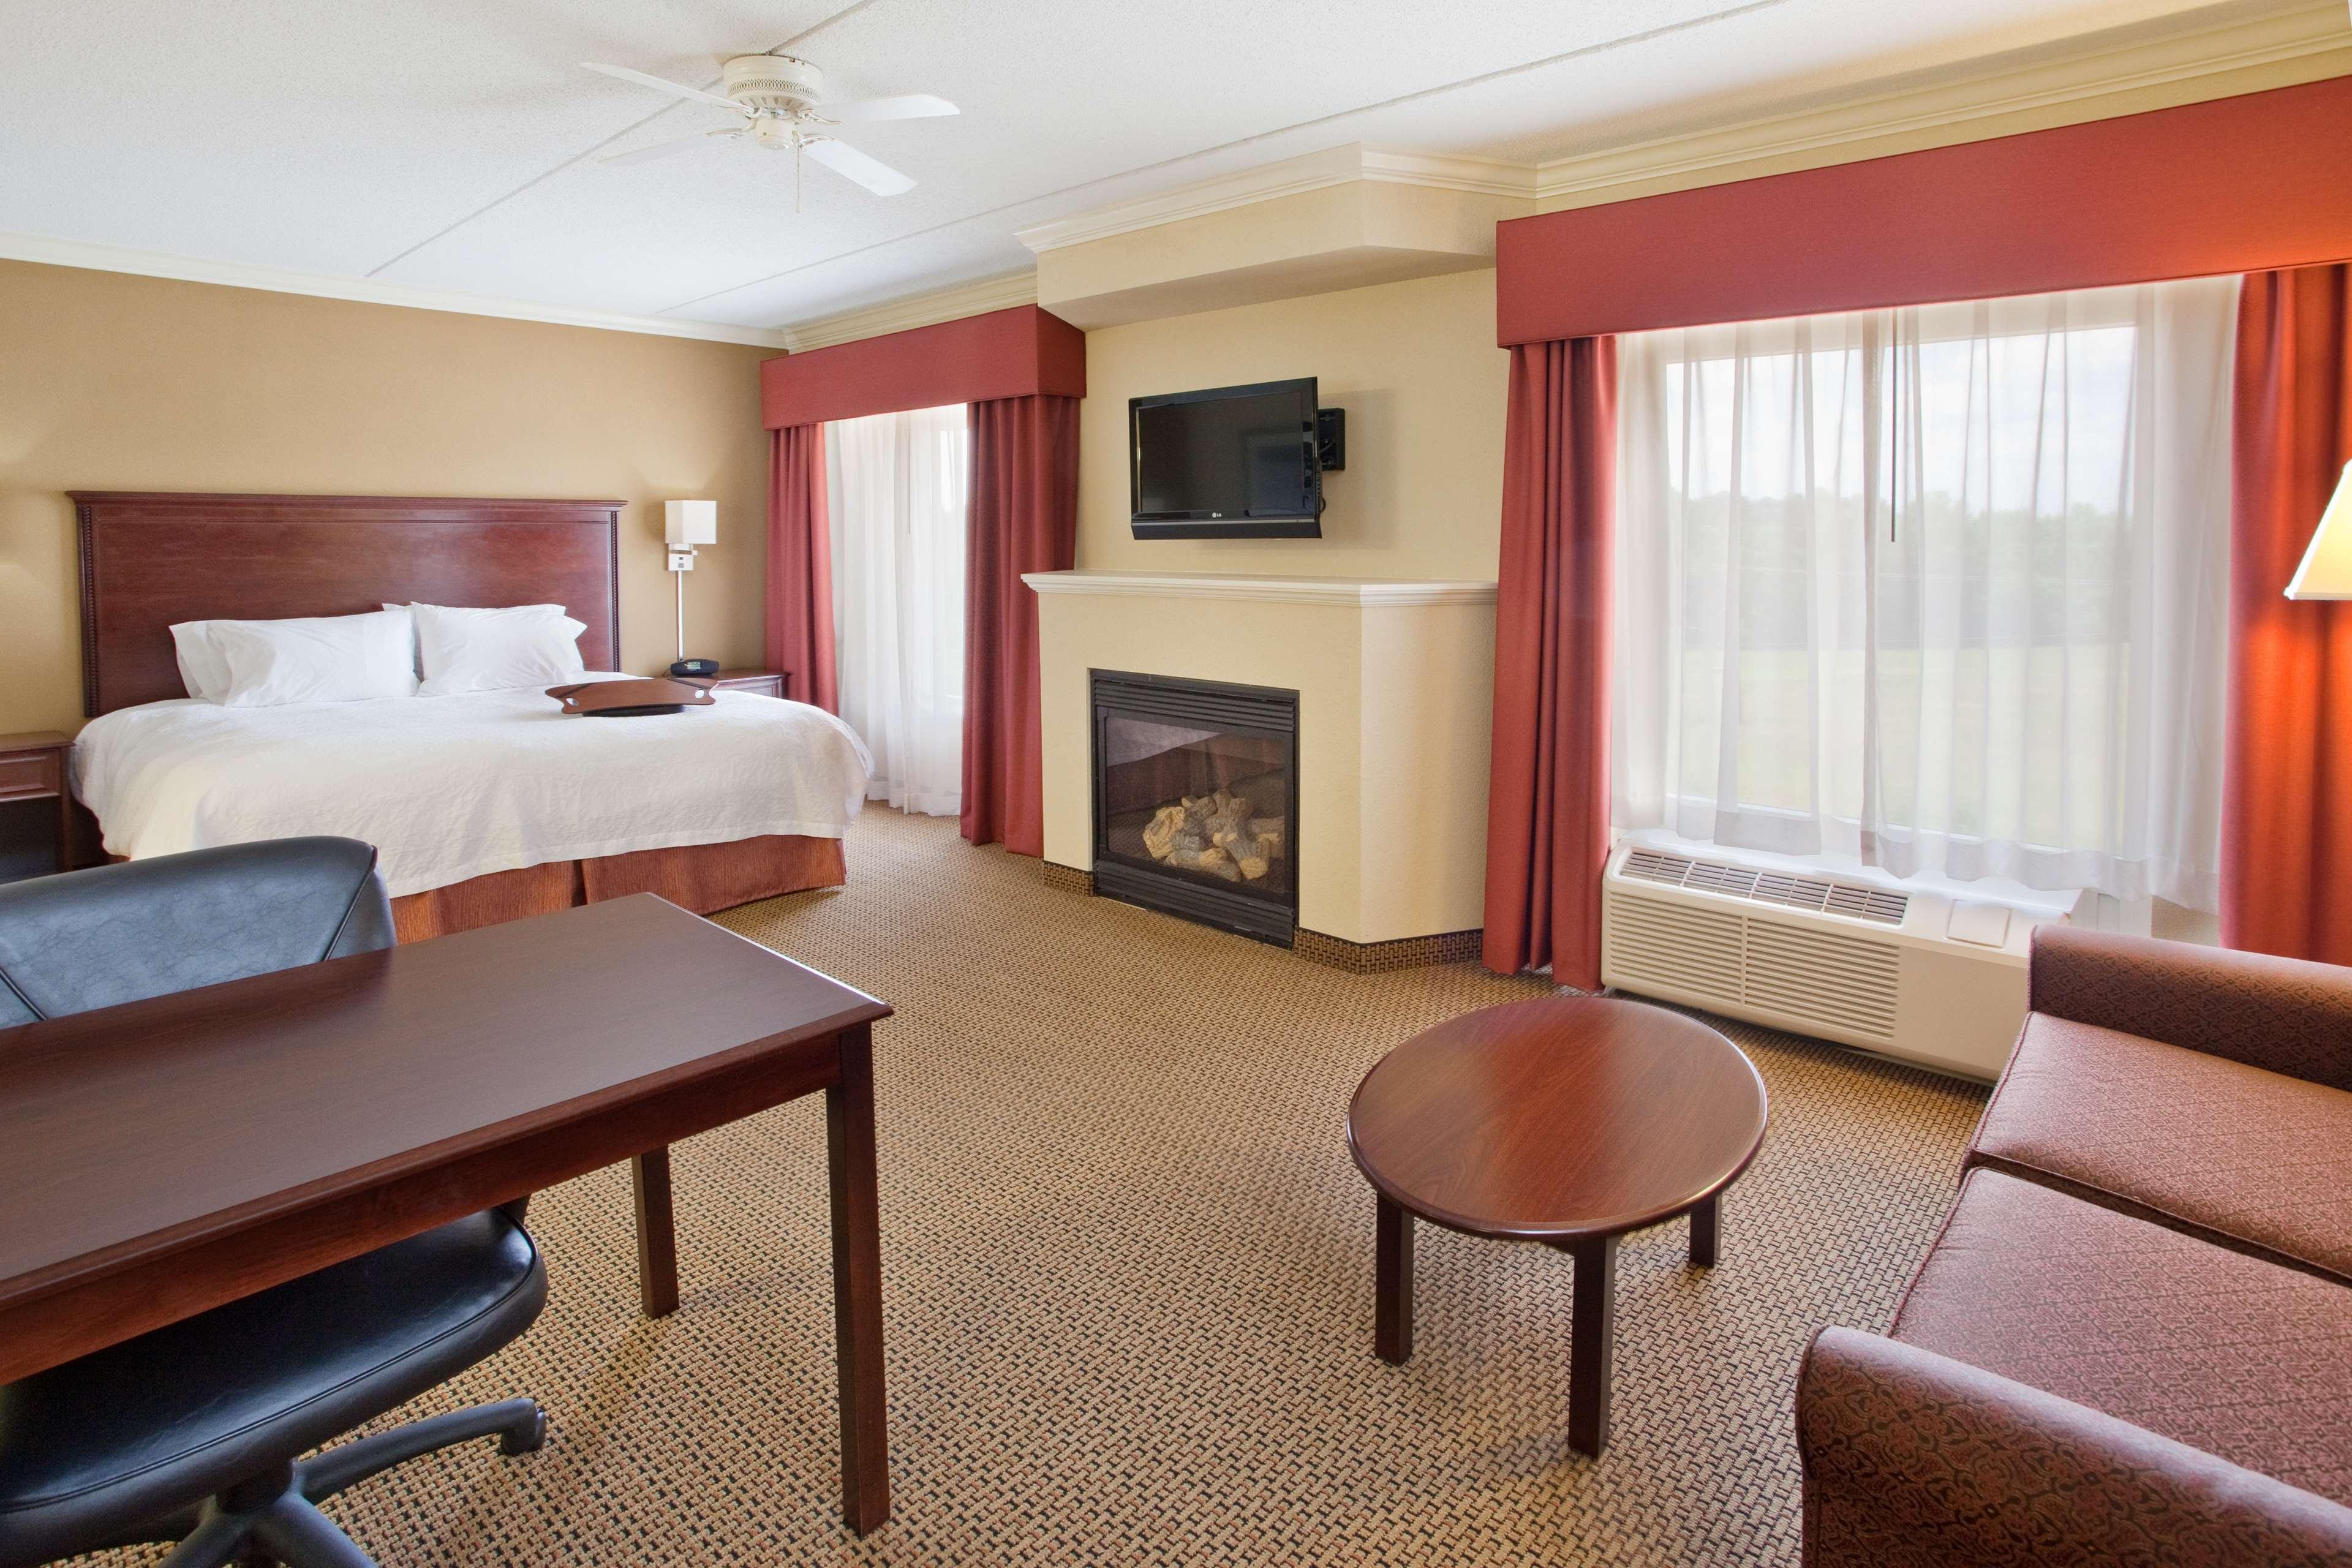 Hampton Inn & Suites Lanett-West Point image 44